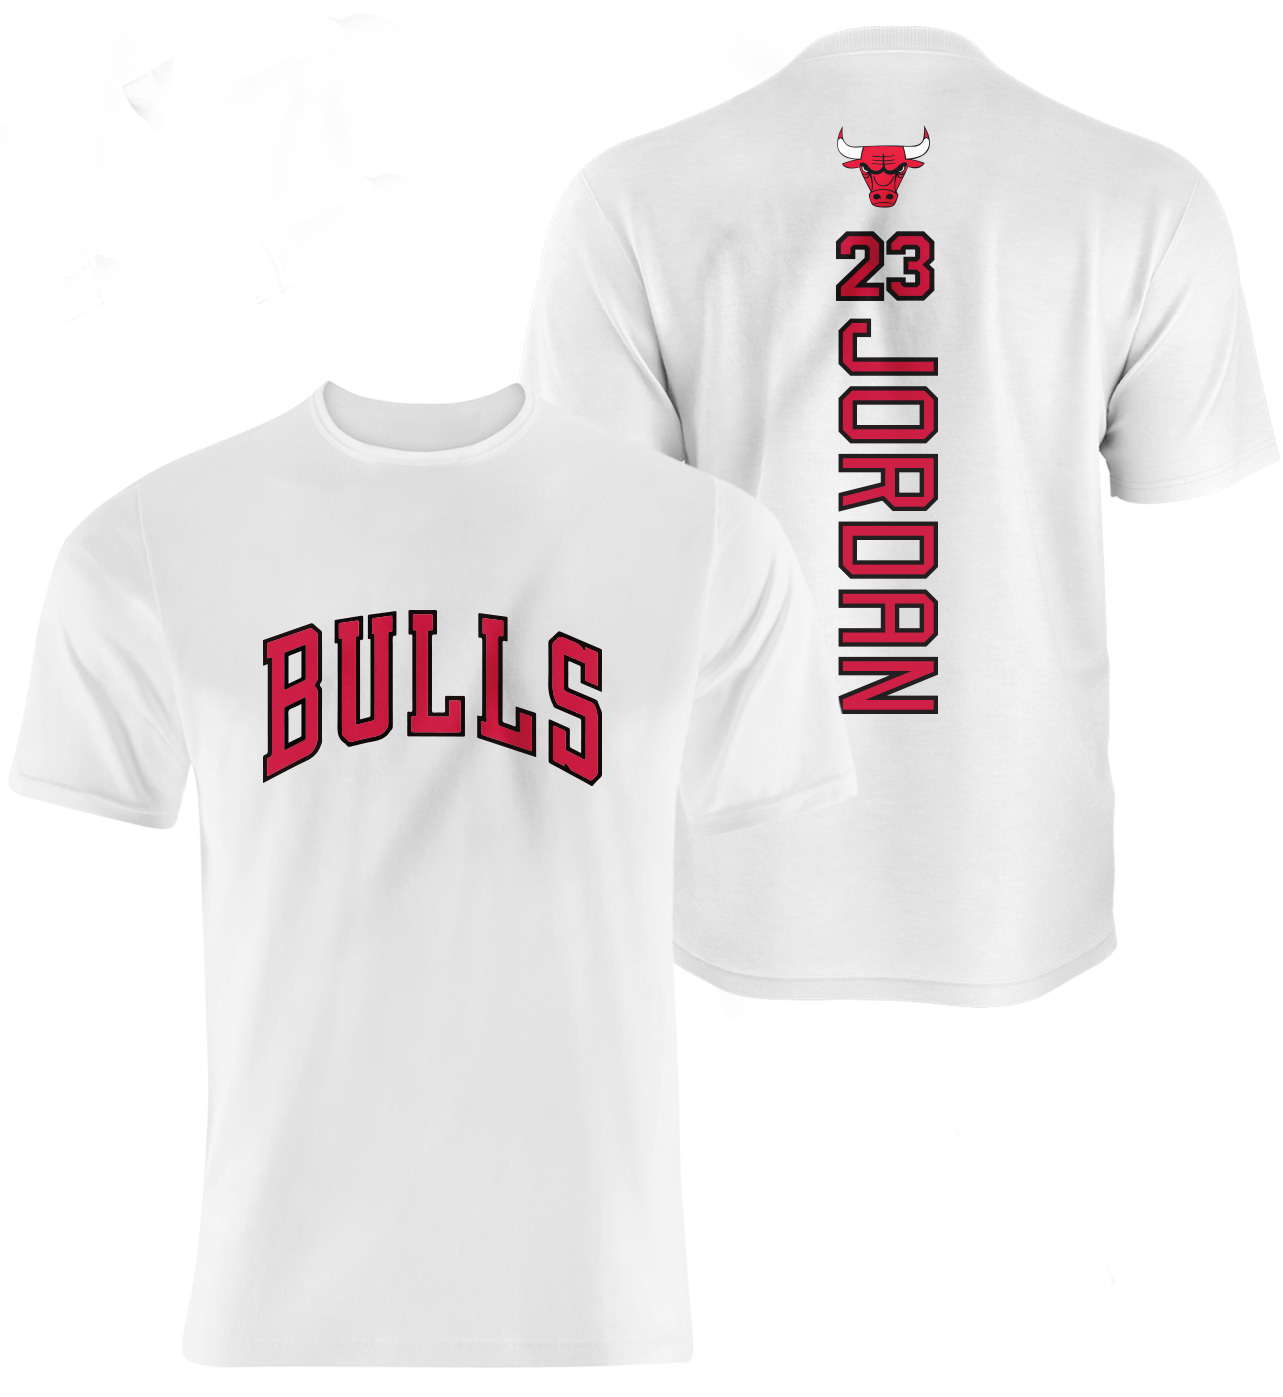 Chicago Bulls Air Jordan Vertical Tshirt (TSH-WHT-49-PLYR-CHI-JORDAN.VER)